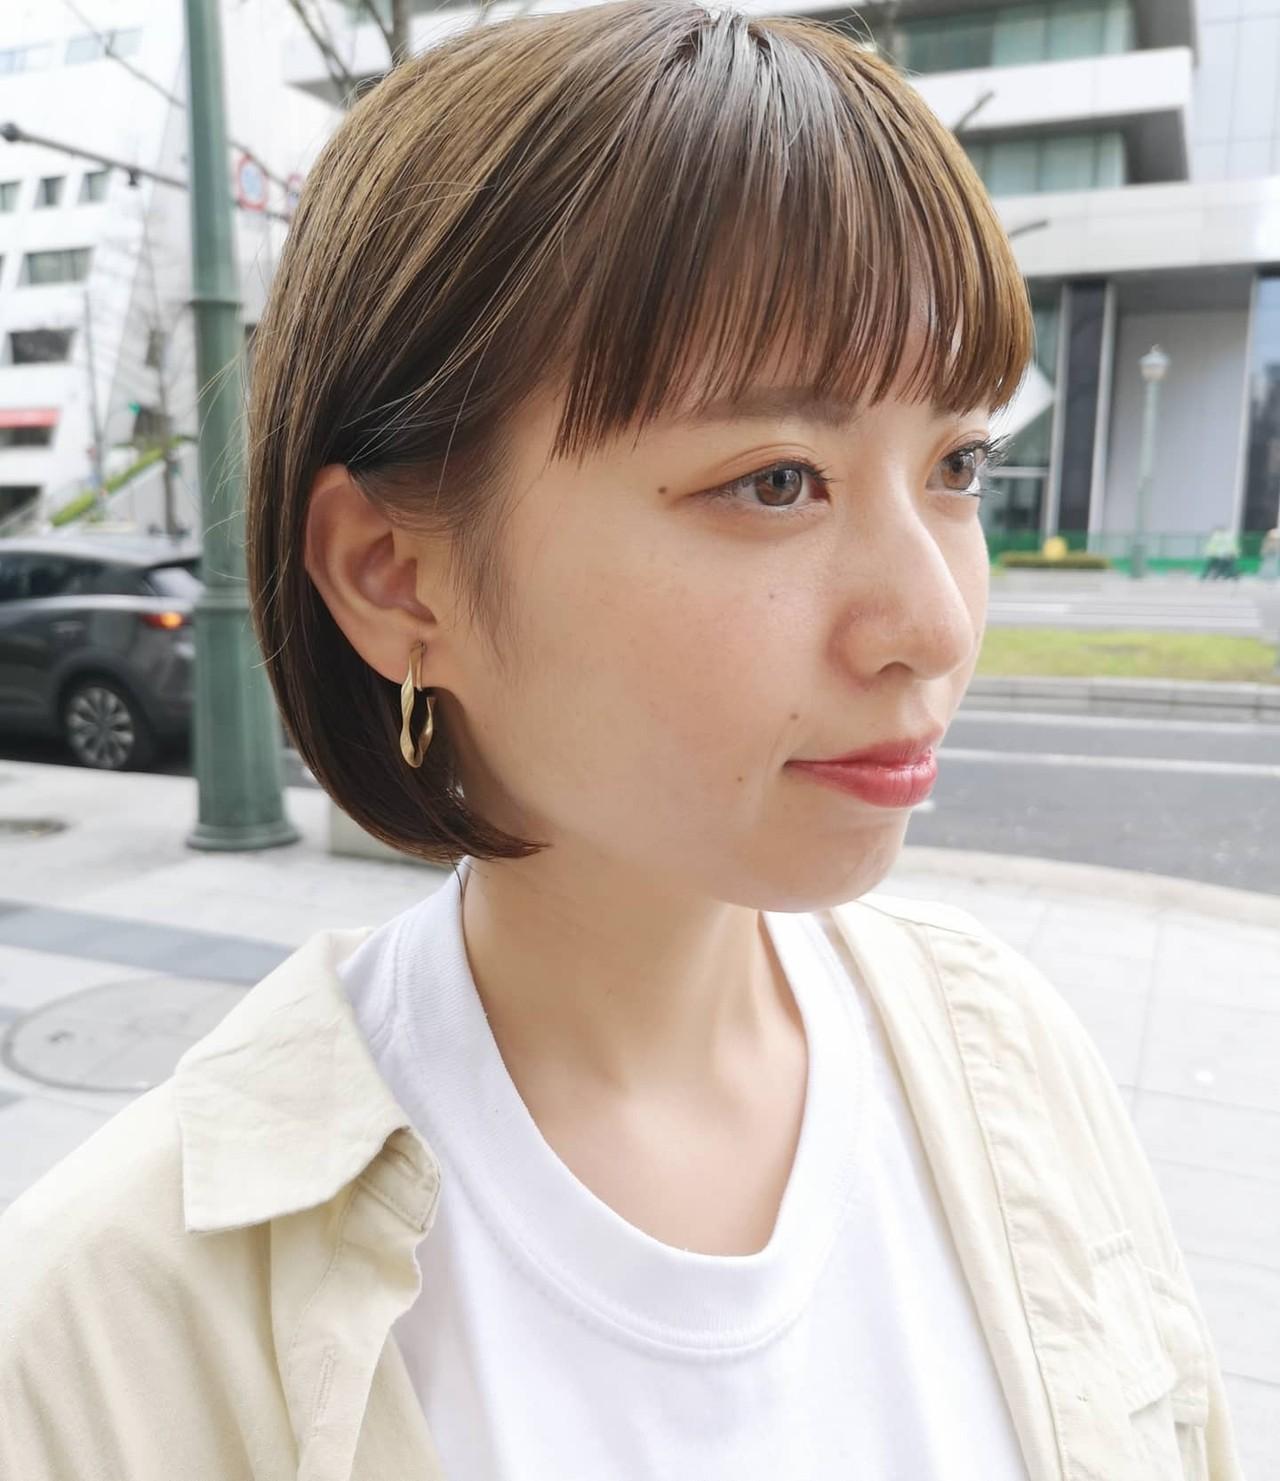 N.オイル ボブ シンプルボブ ナチュラル ヘアスタイルや髪型の写真・画像 | Yusuke Matsumoto / HAIR'S Lunetta 心斎橋